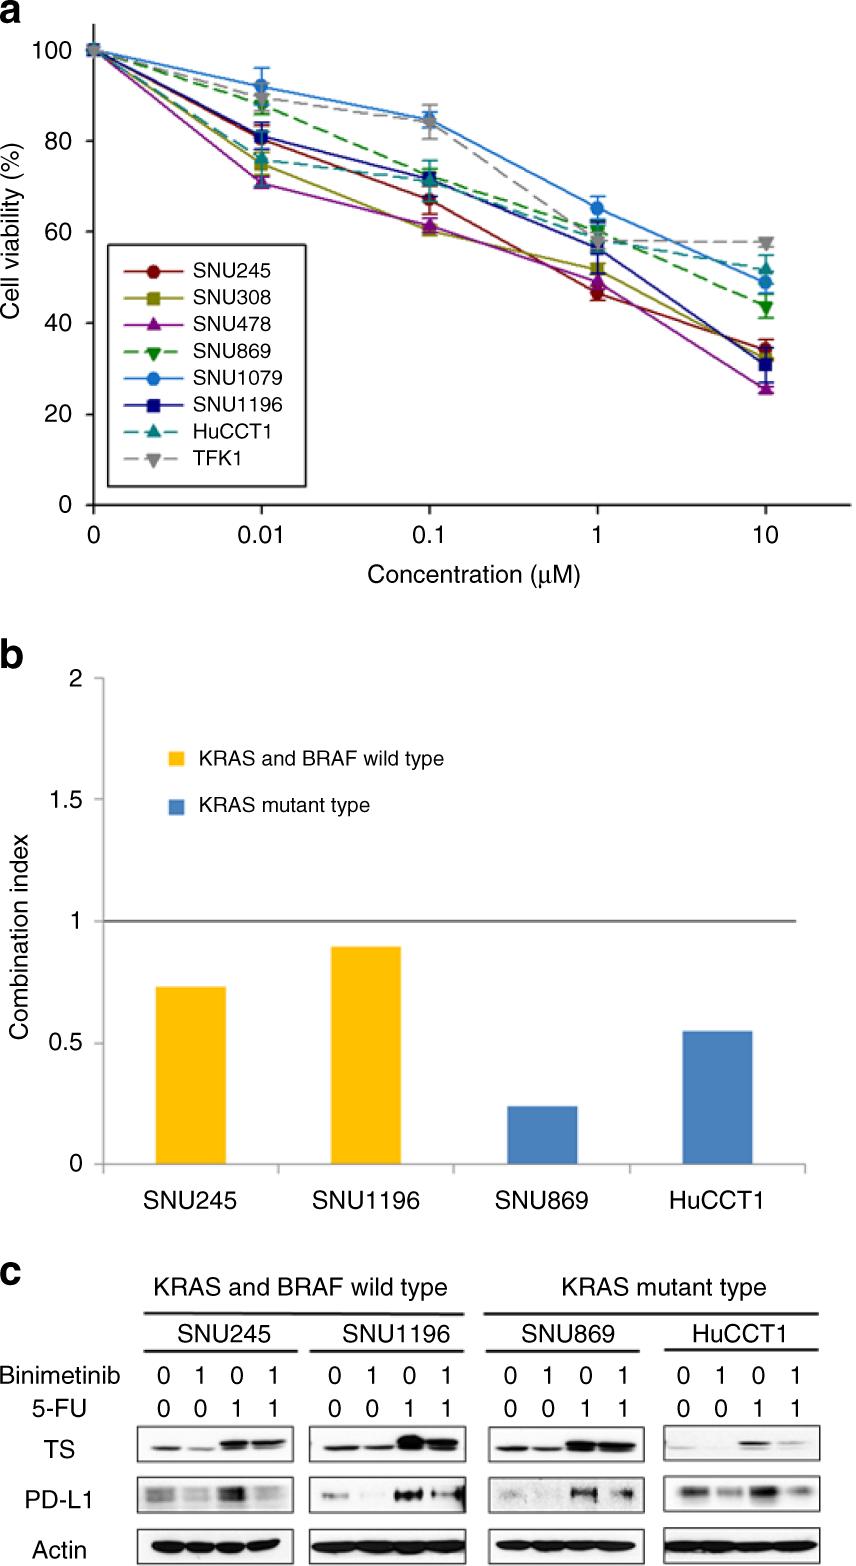 Enhanced antitumor effect of binimetinib in combination with